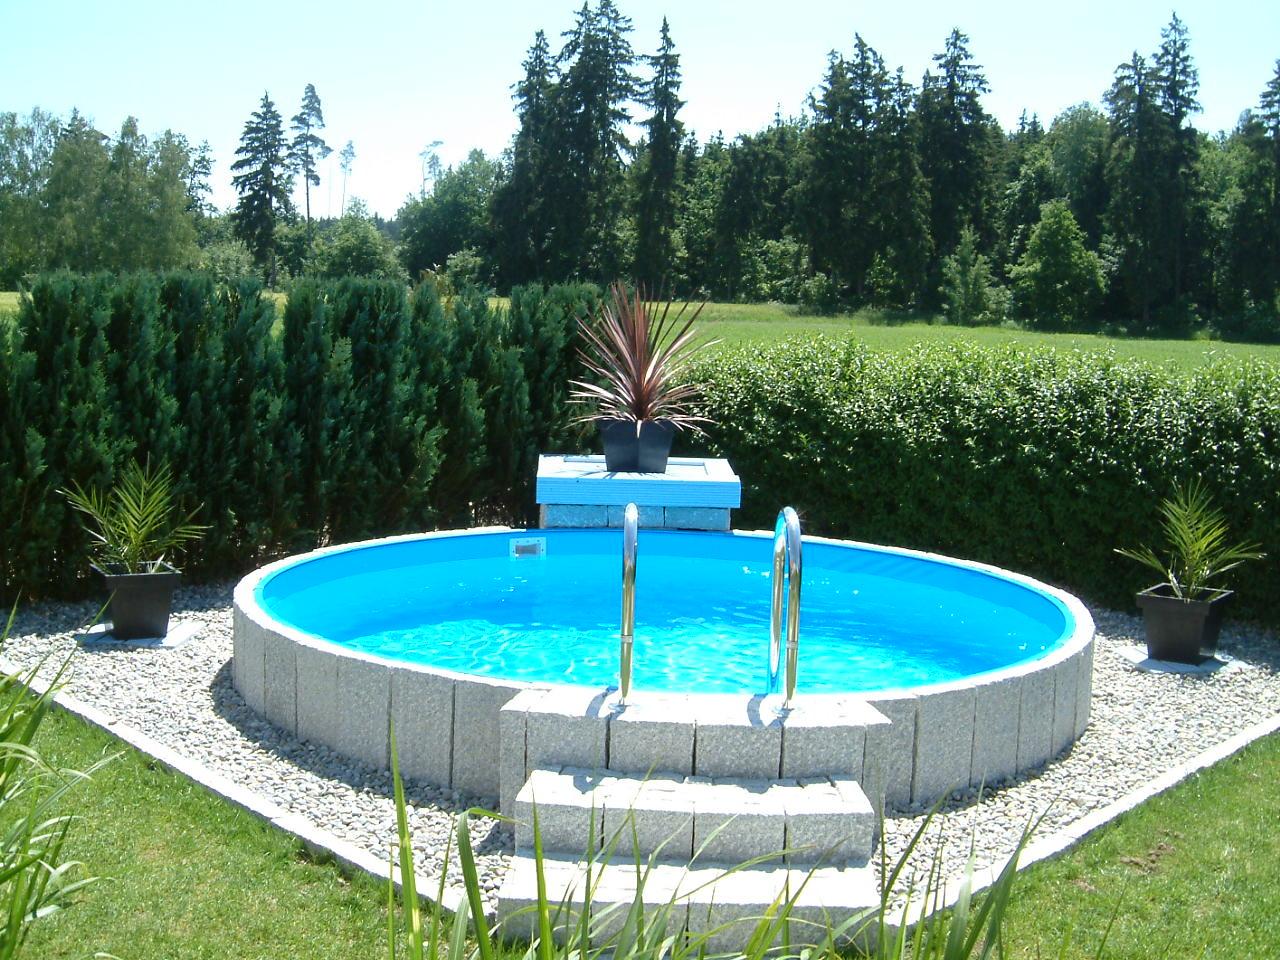 Stahlwandpool Pool Heizung Freizeit